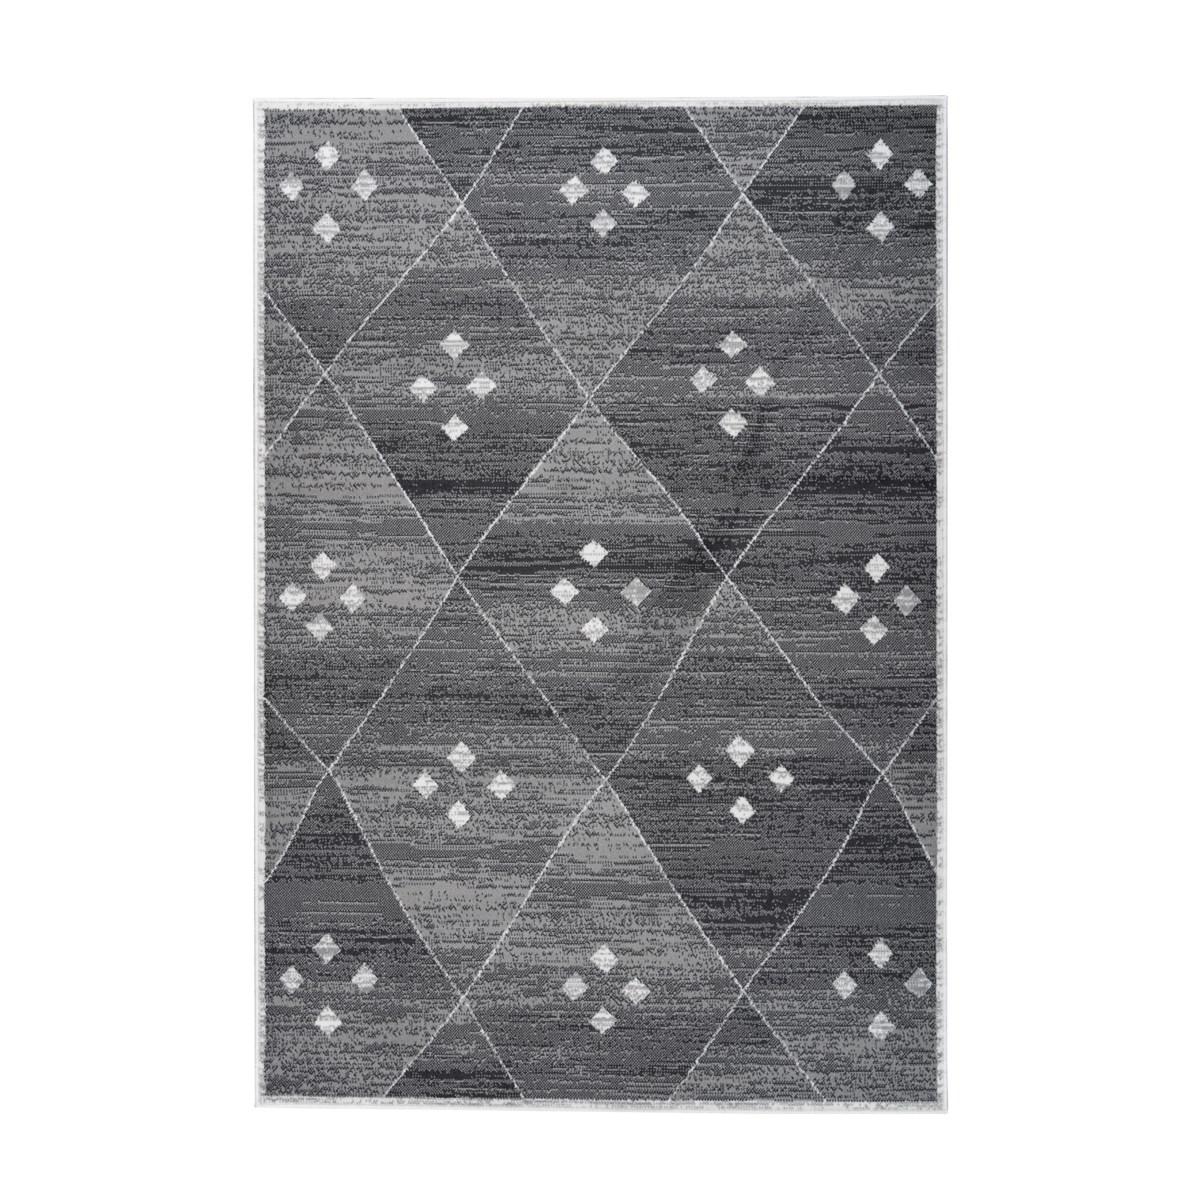 Tapis de salon en Polypropylène Gris 160x230 cm